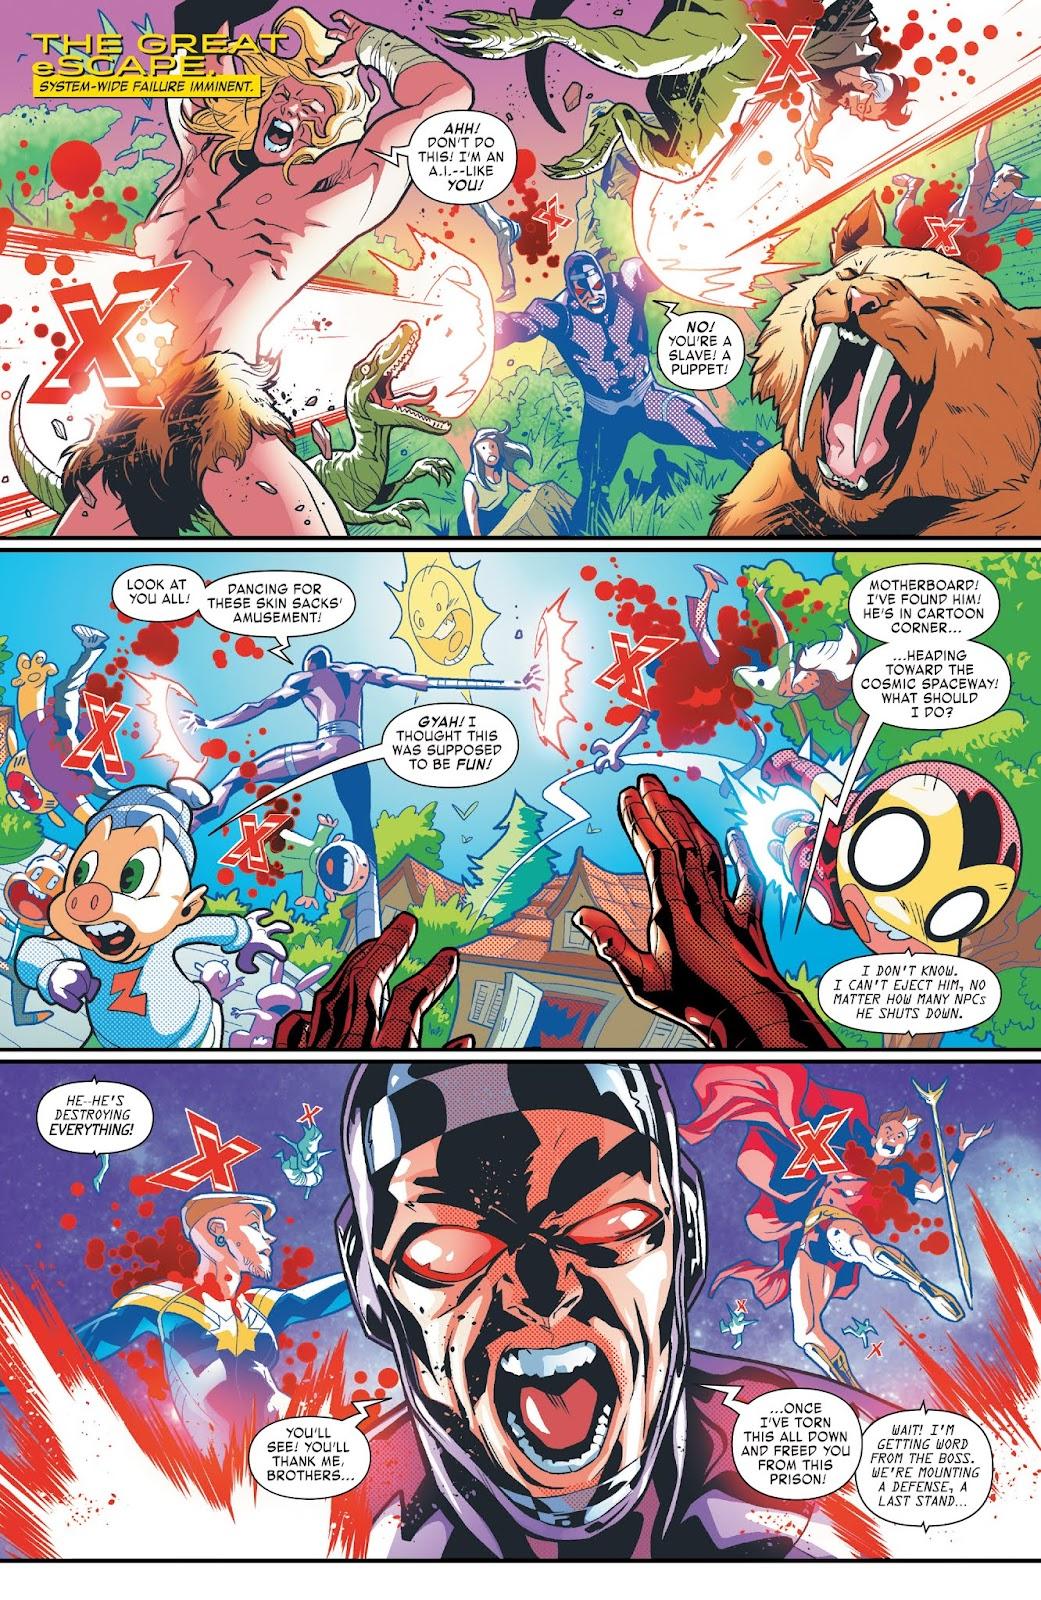 Read online Tony Stark: Iron Man comic -  Issue #3 - 15